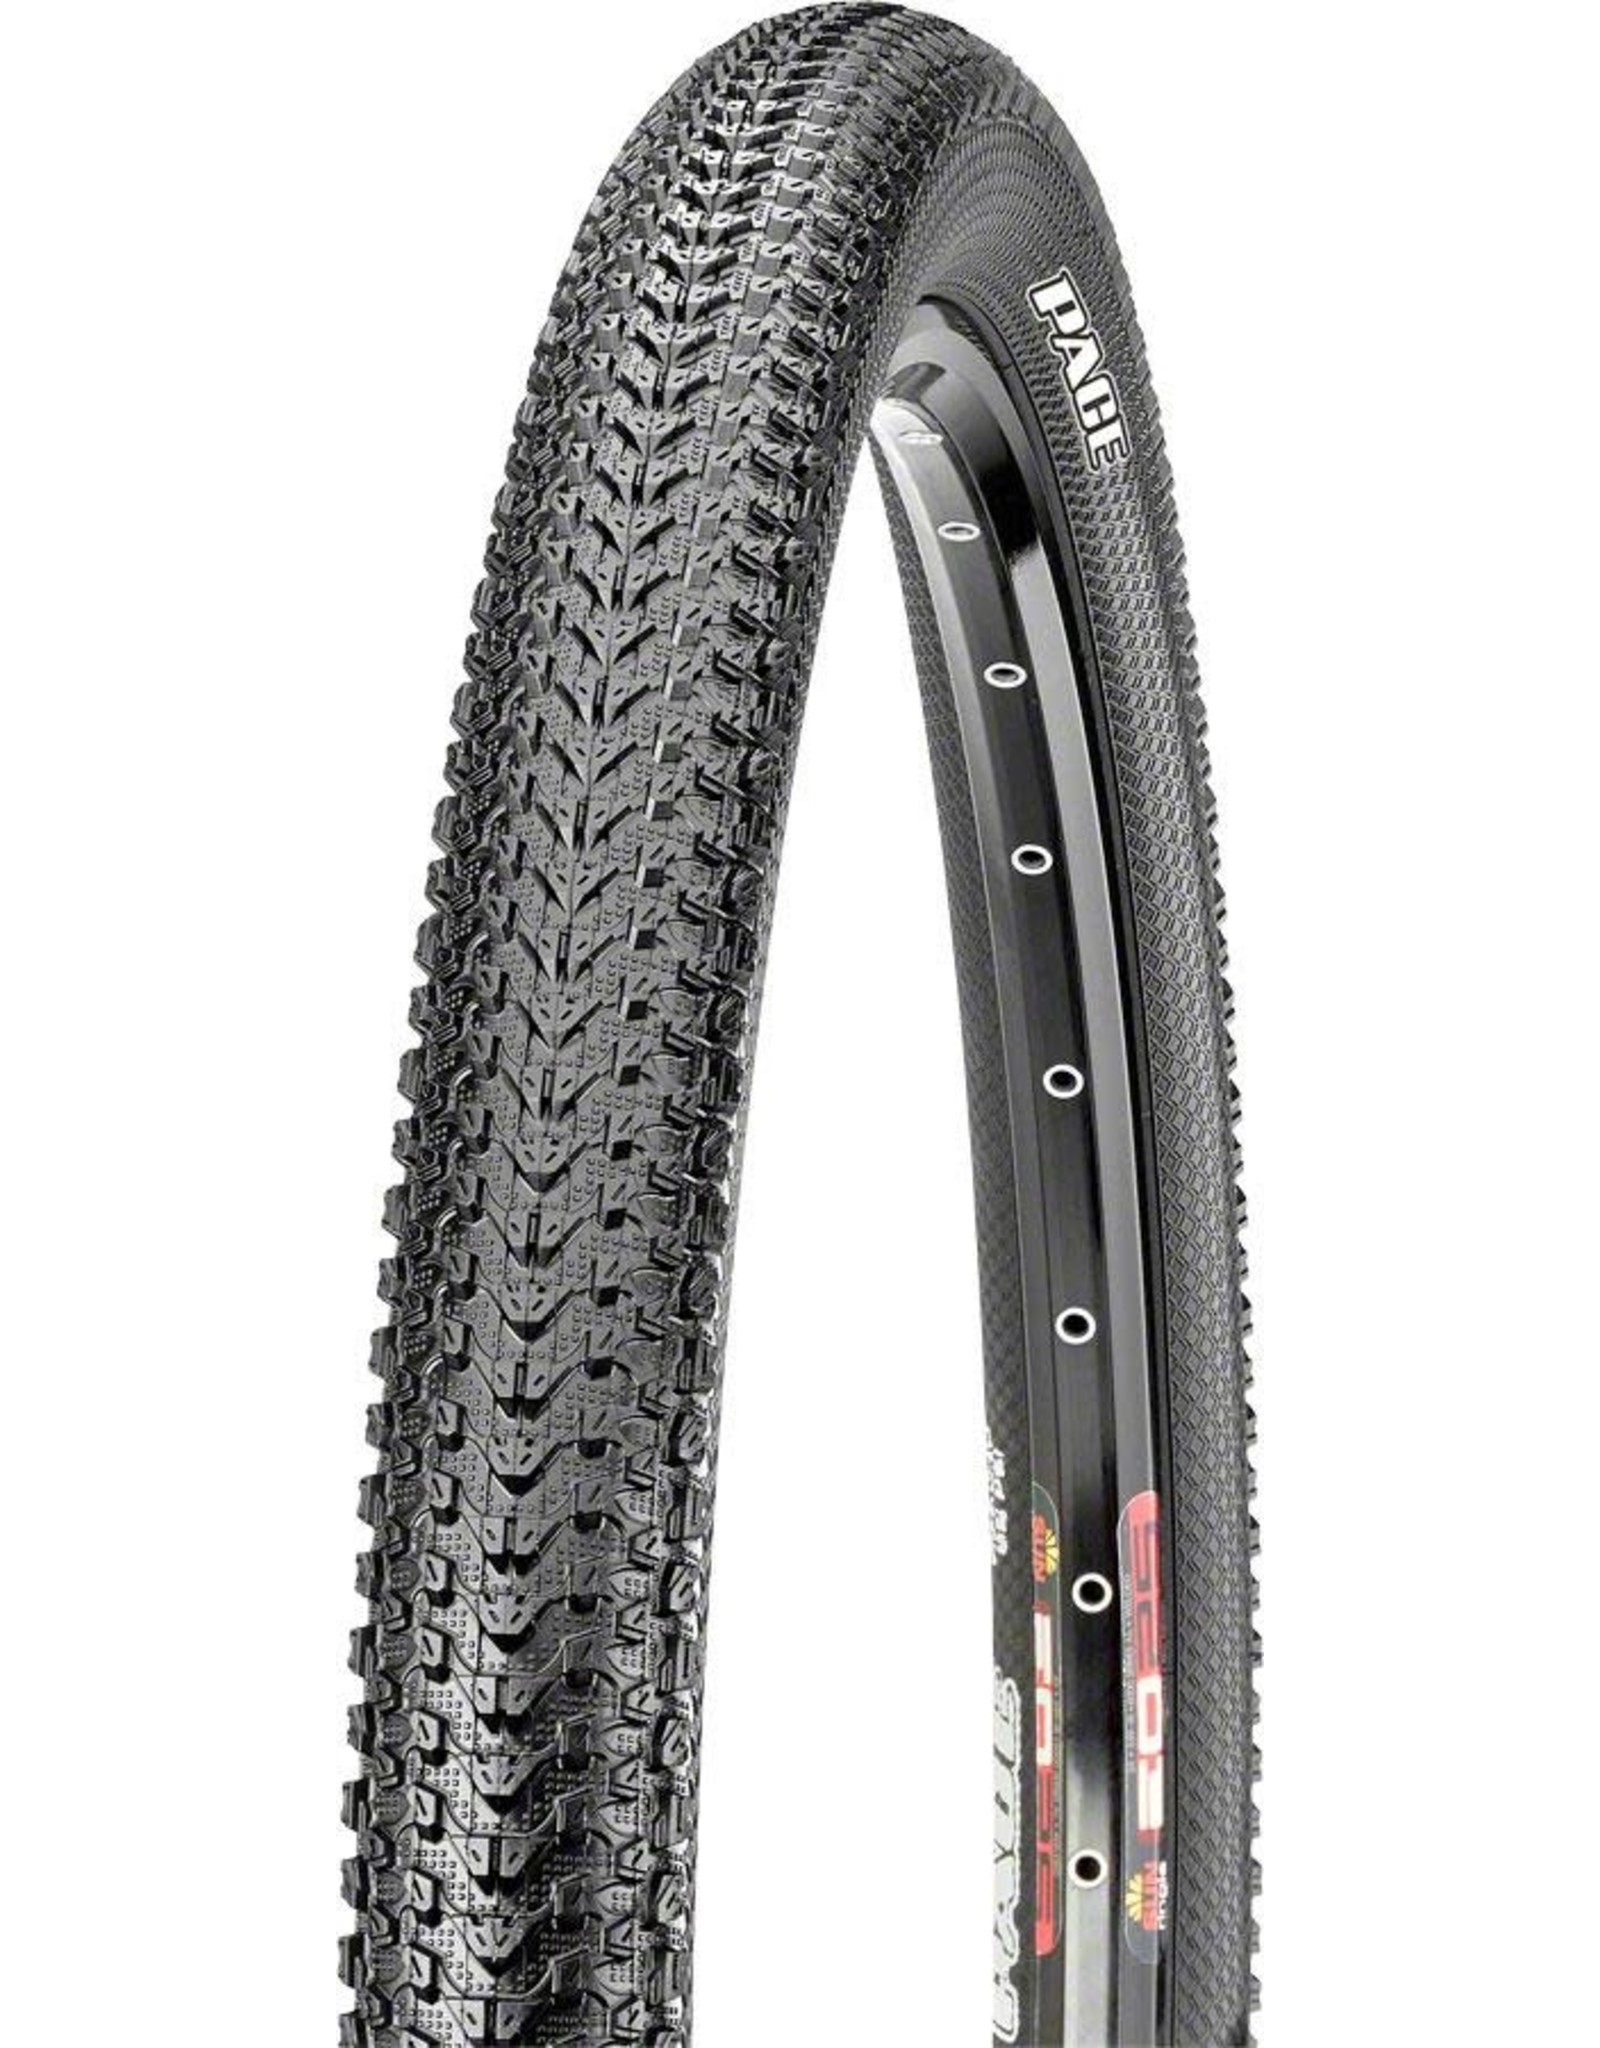 Maxxis Maxxis - Pace Tire - 29 x 2.10, Tubeless, Folding, Black, Dual, EXO